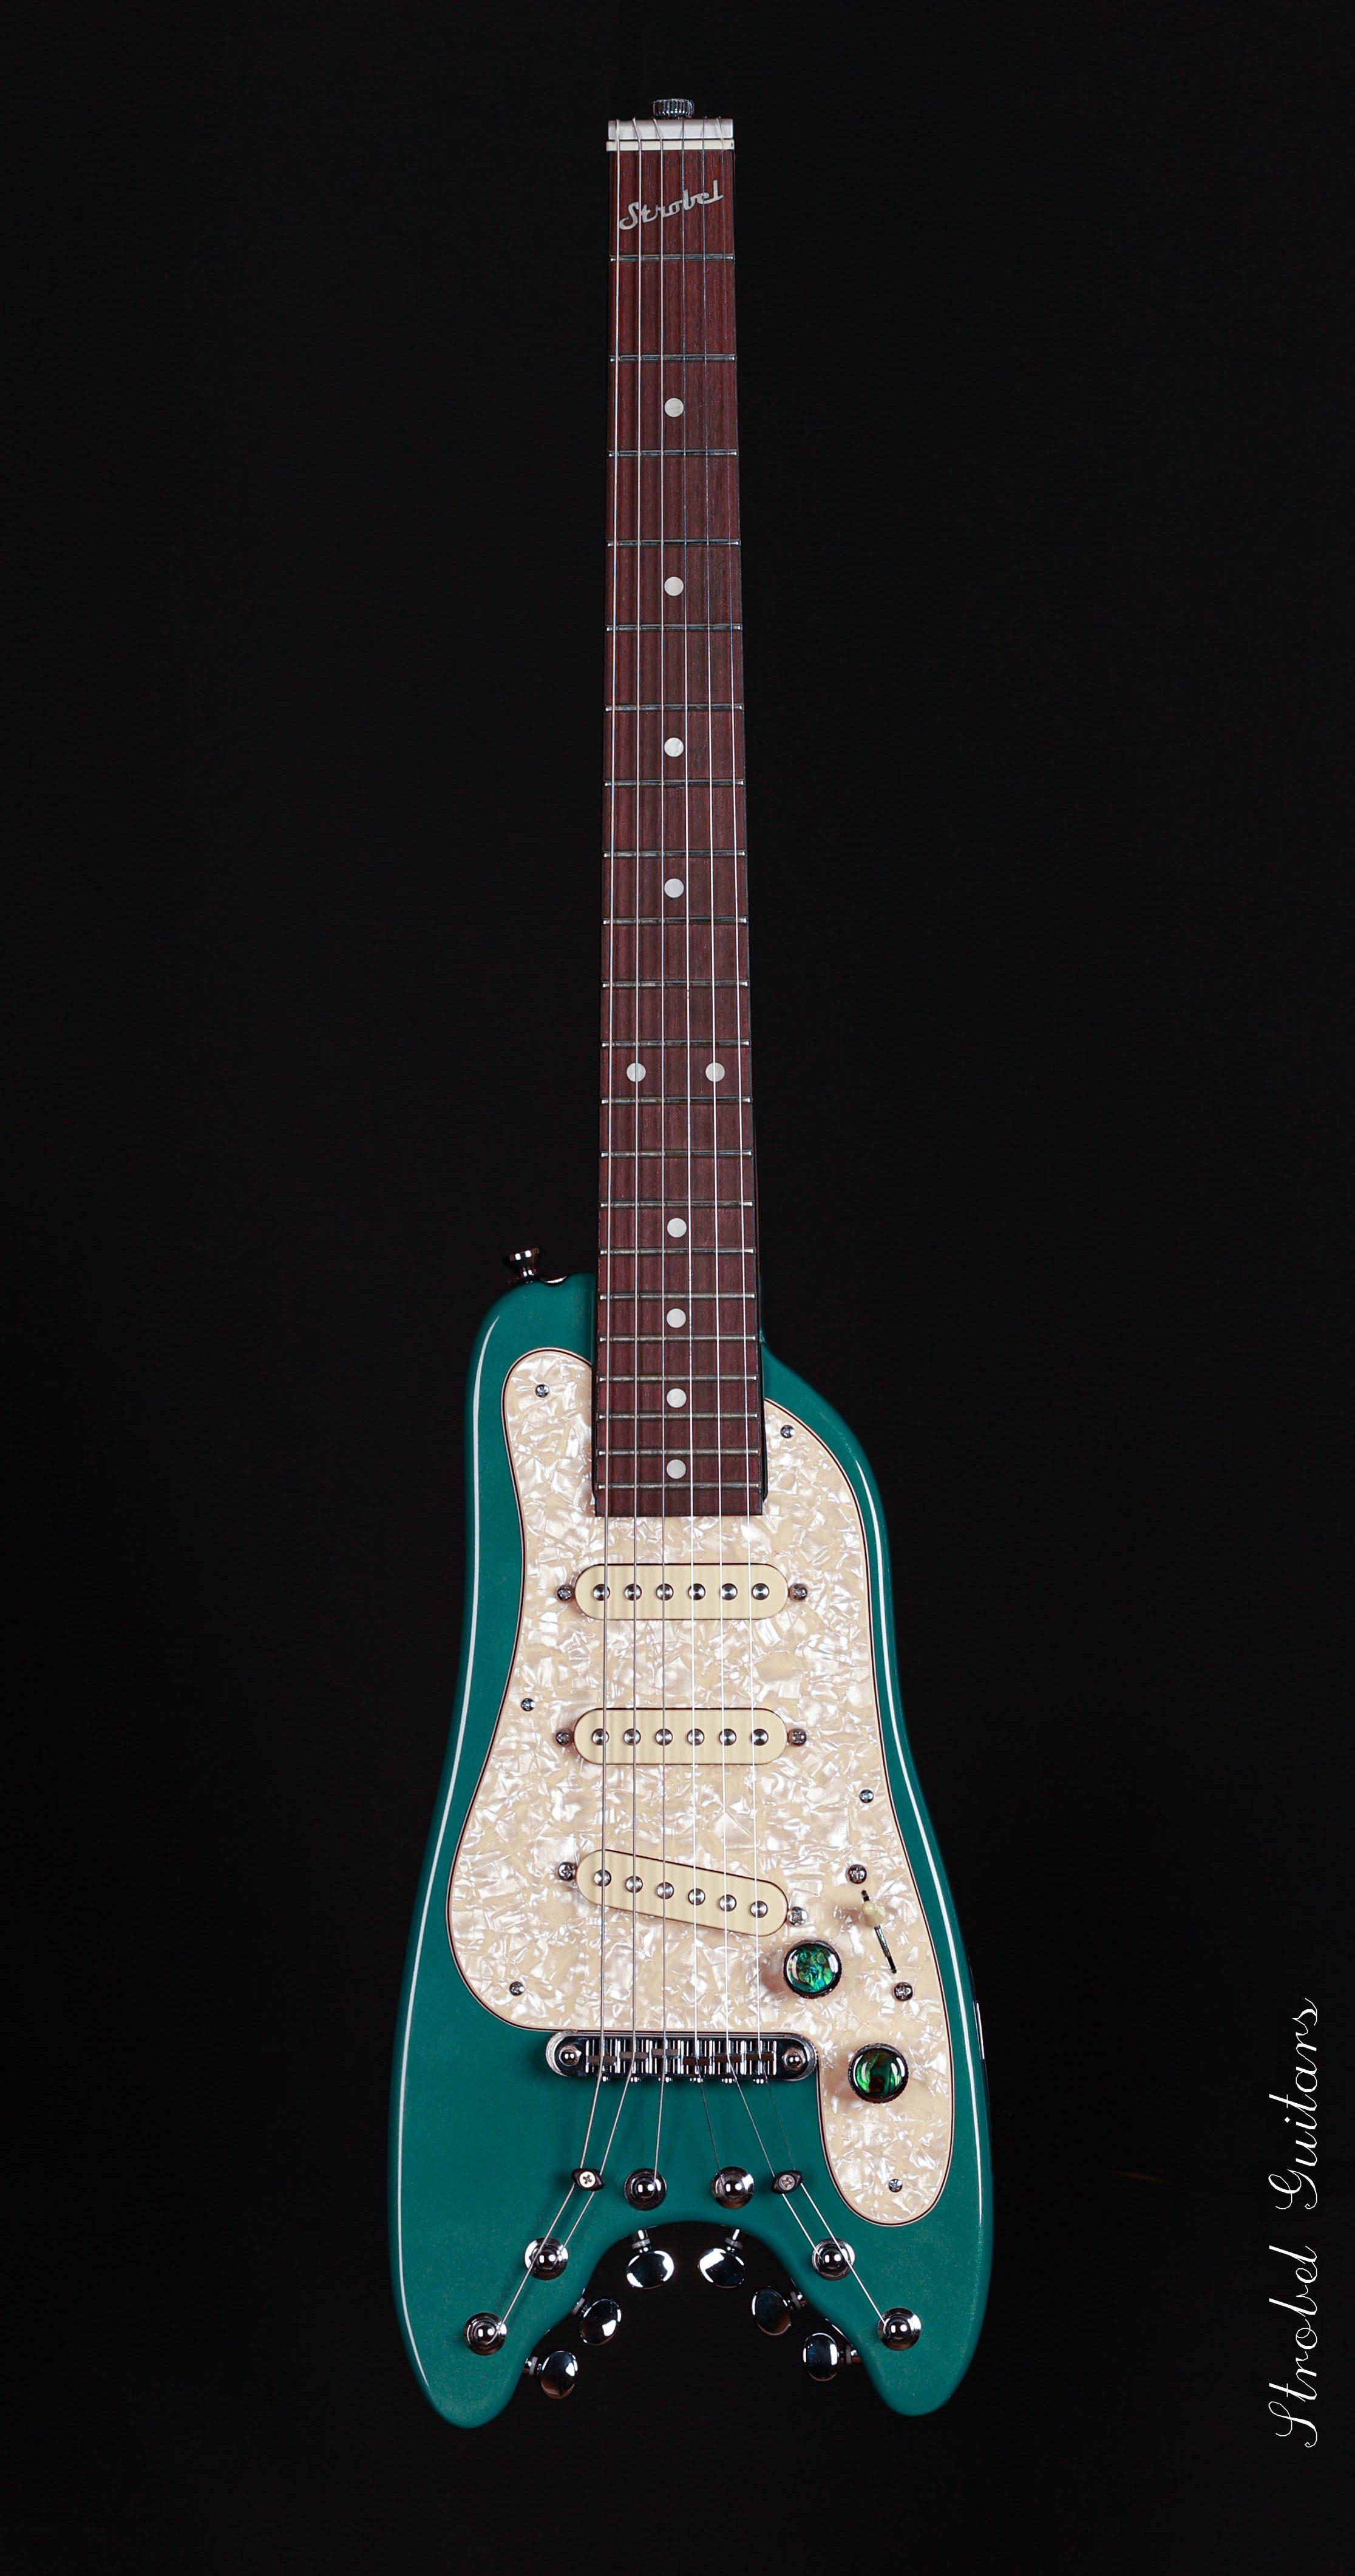 Electric-Travel-Guitar-STROBELCASTER -Sherwood-Green